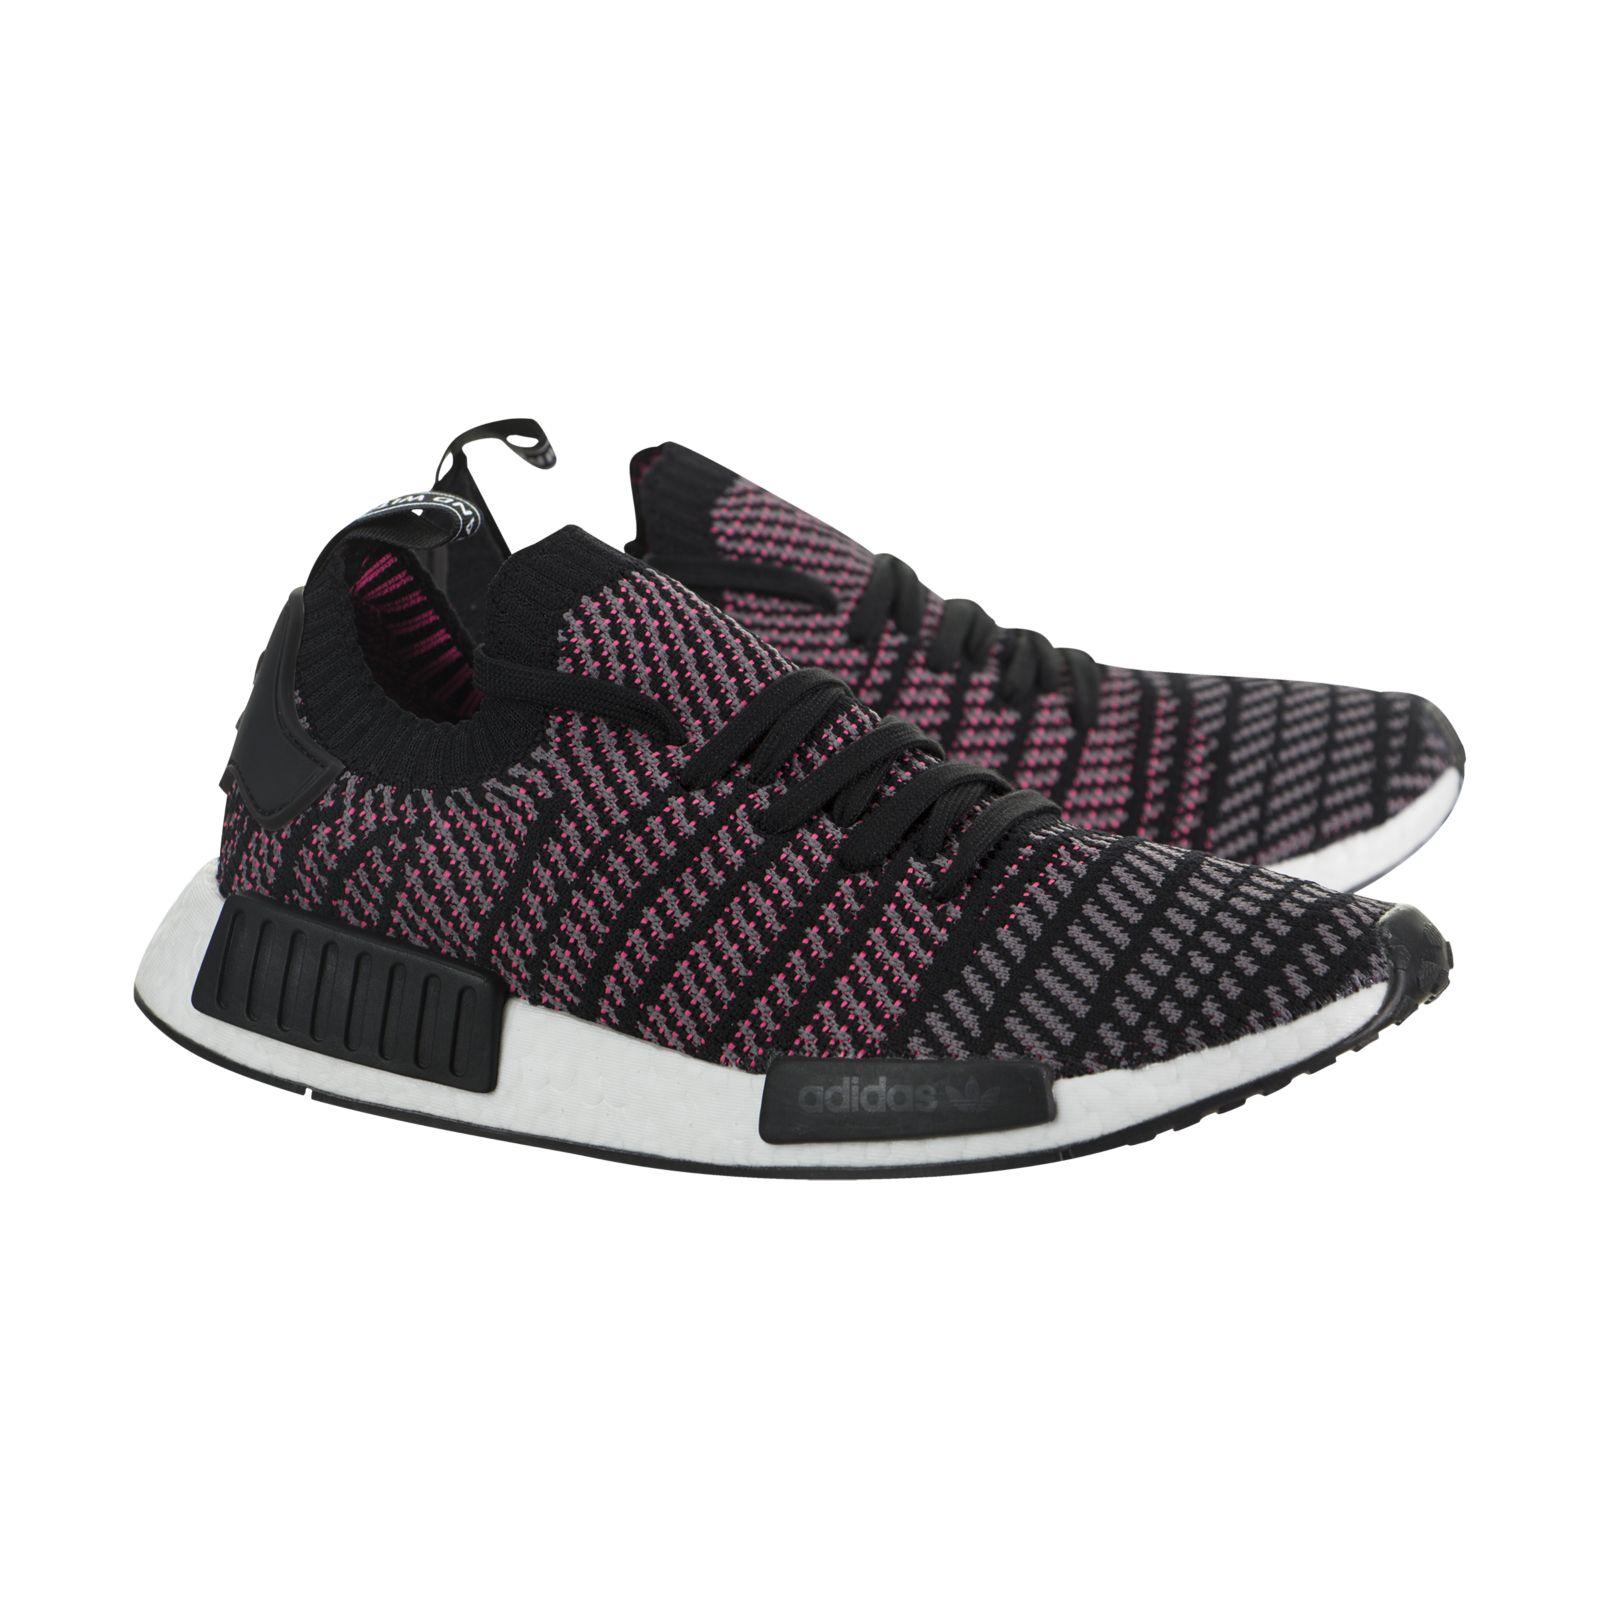 Men's Adidas NMD R1 Primeknit STLT Solar Pink CQ2386